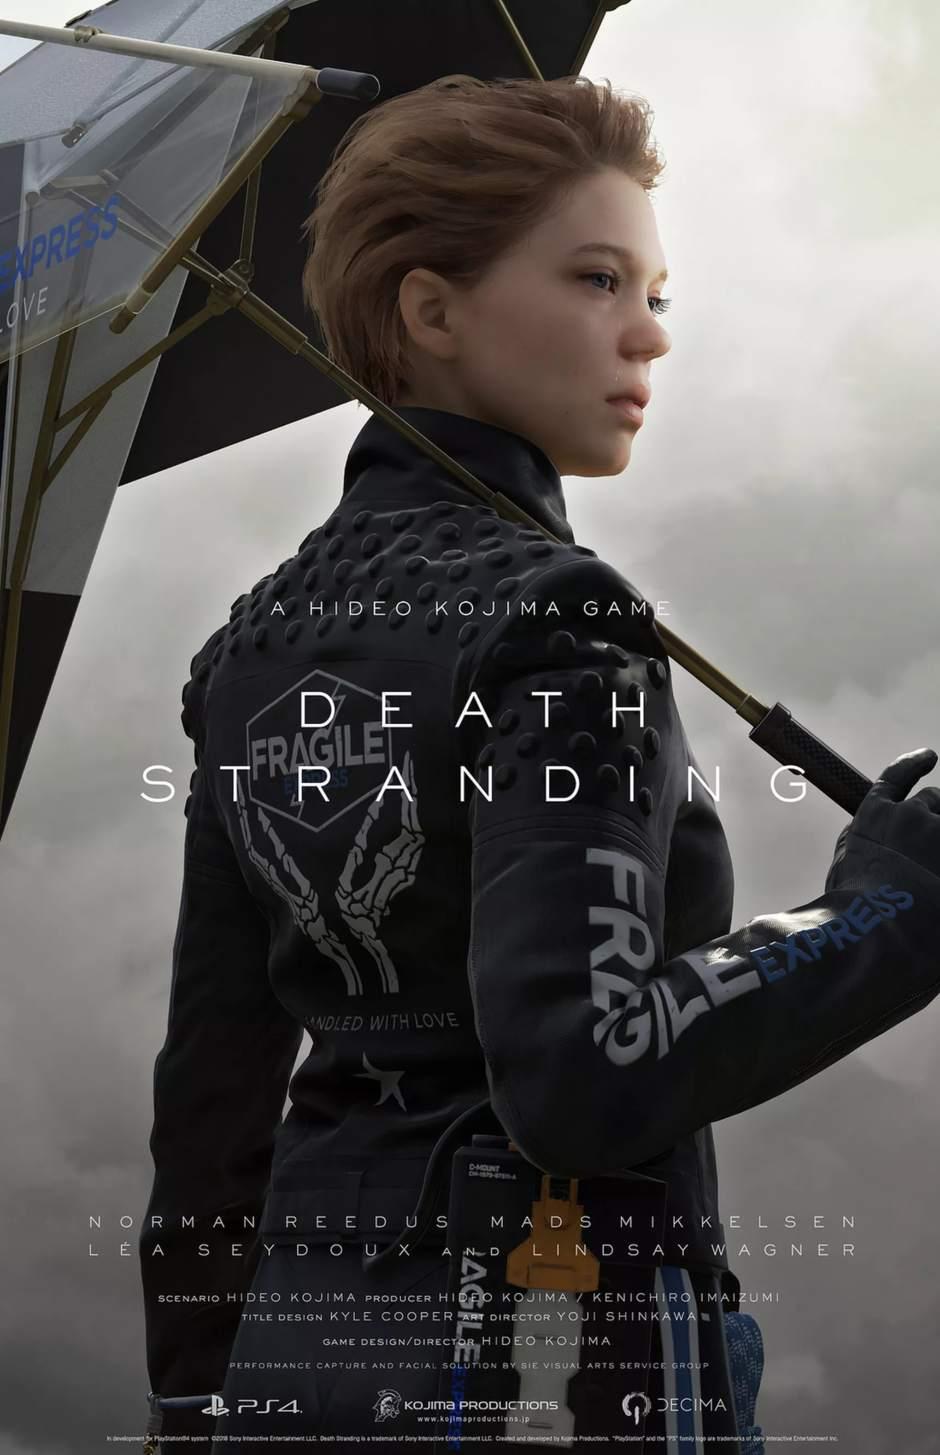 GT_Death_Stranding_00 (1).jpg